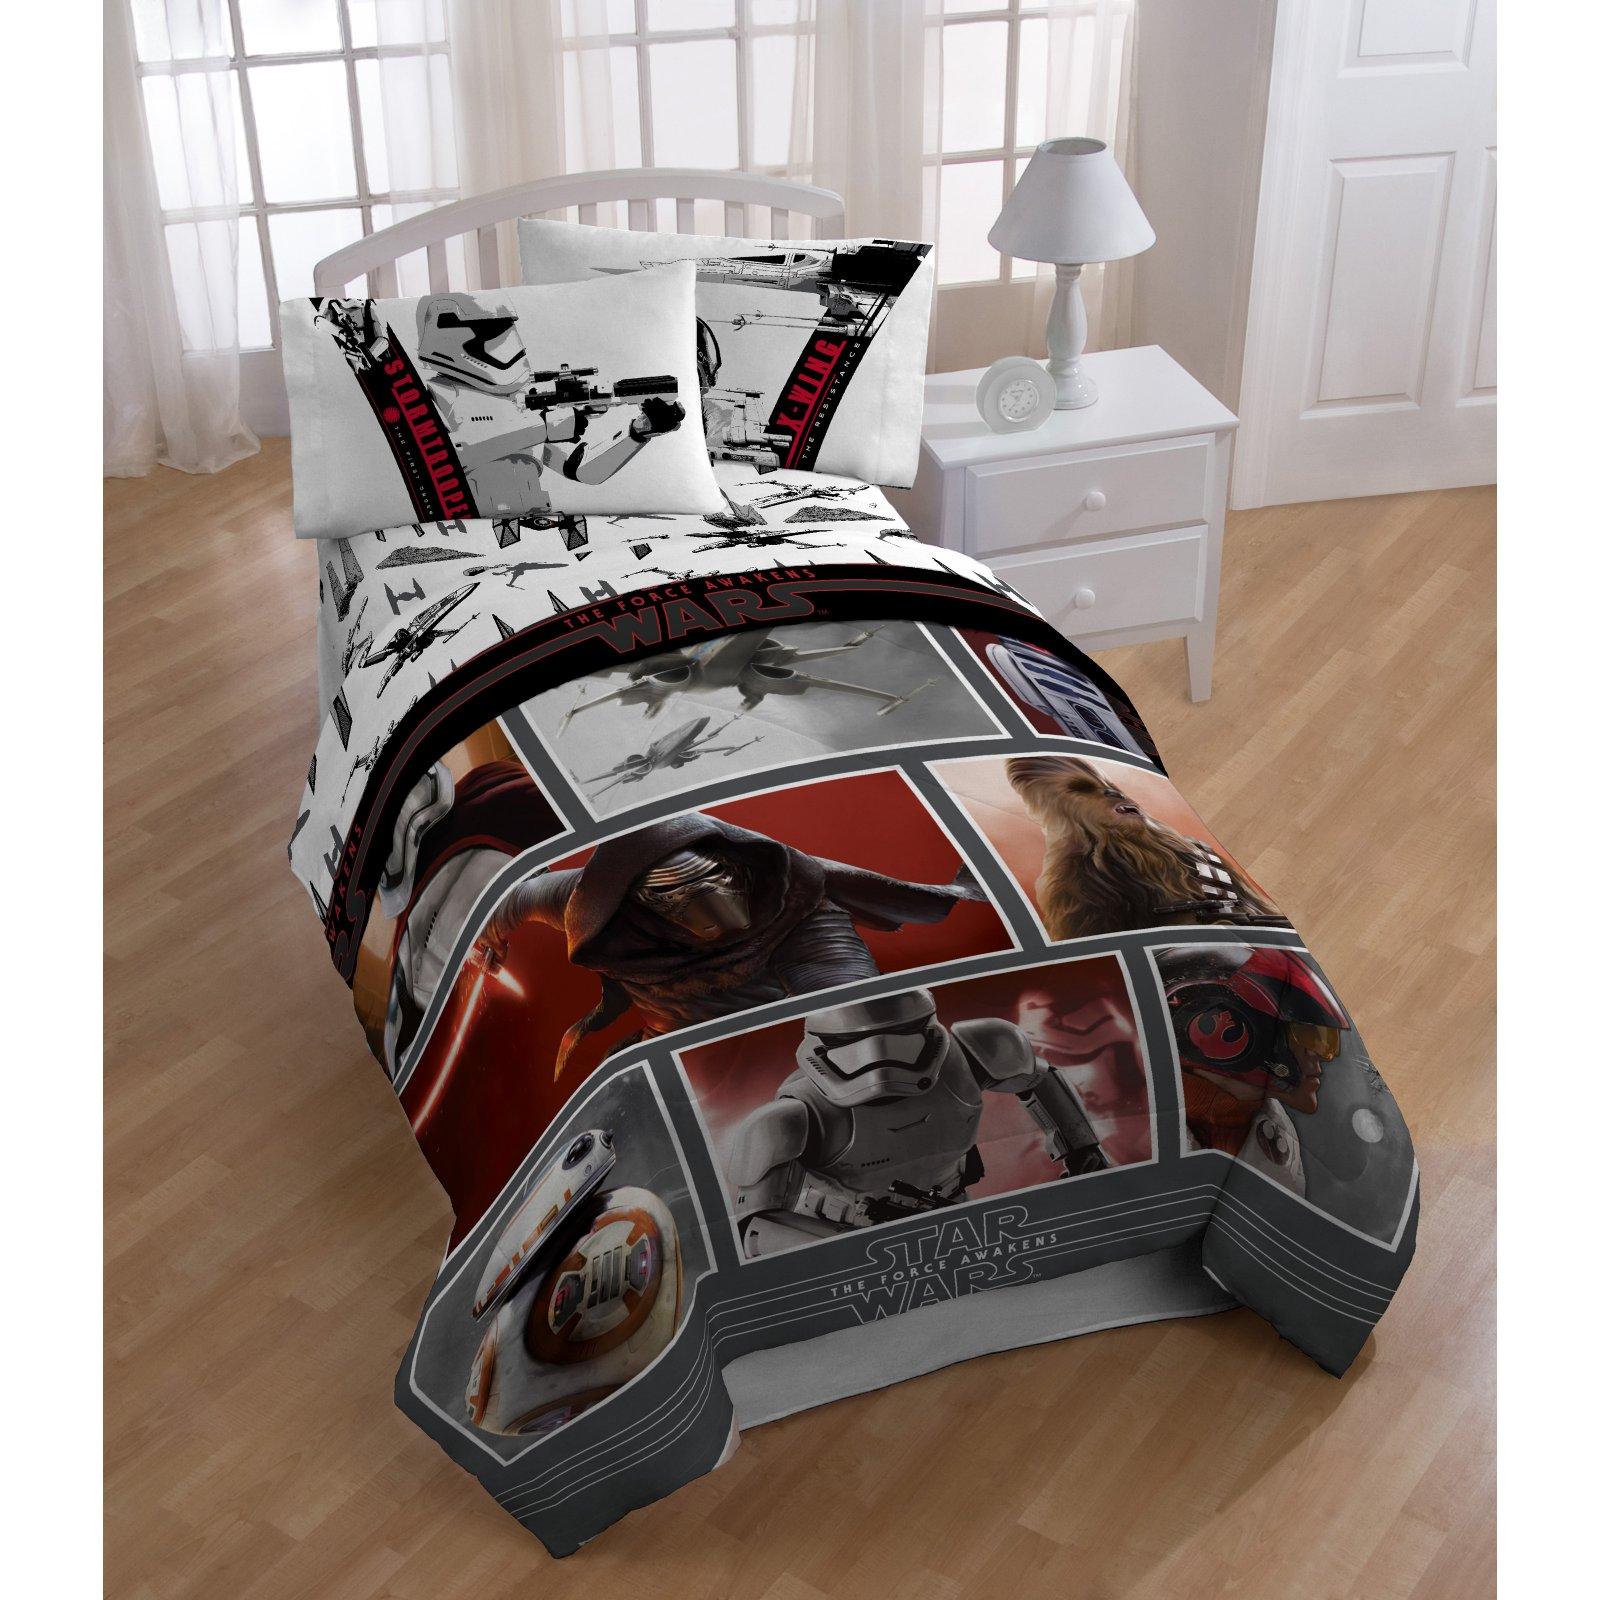 Star Wars Episode VII Live Action Reversible Comforter by Star Wars